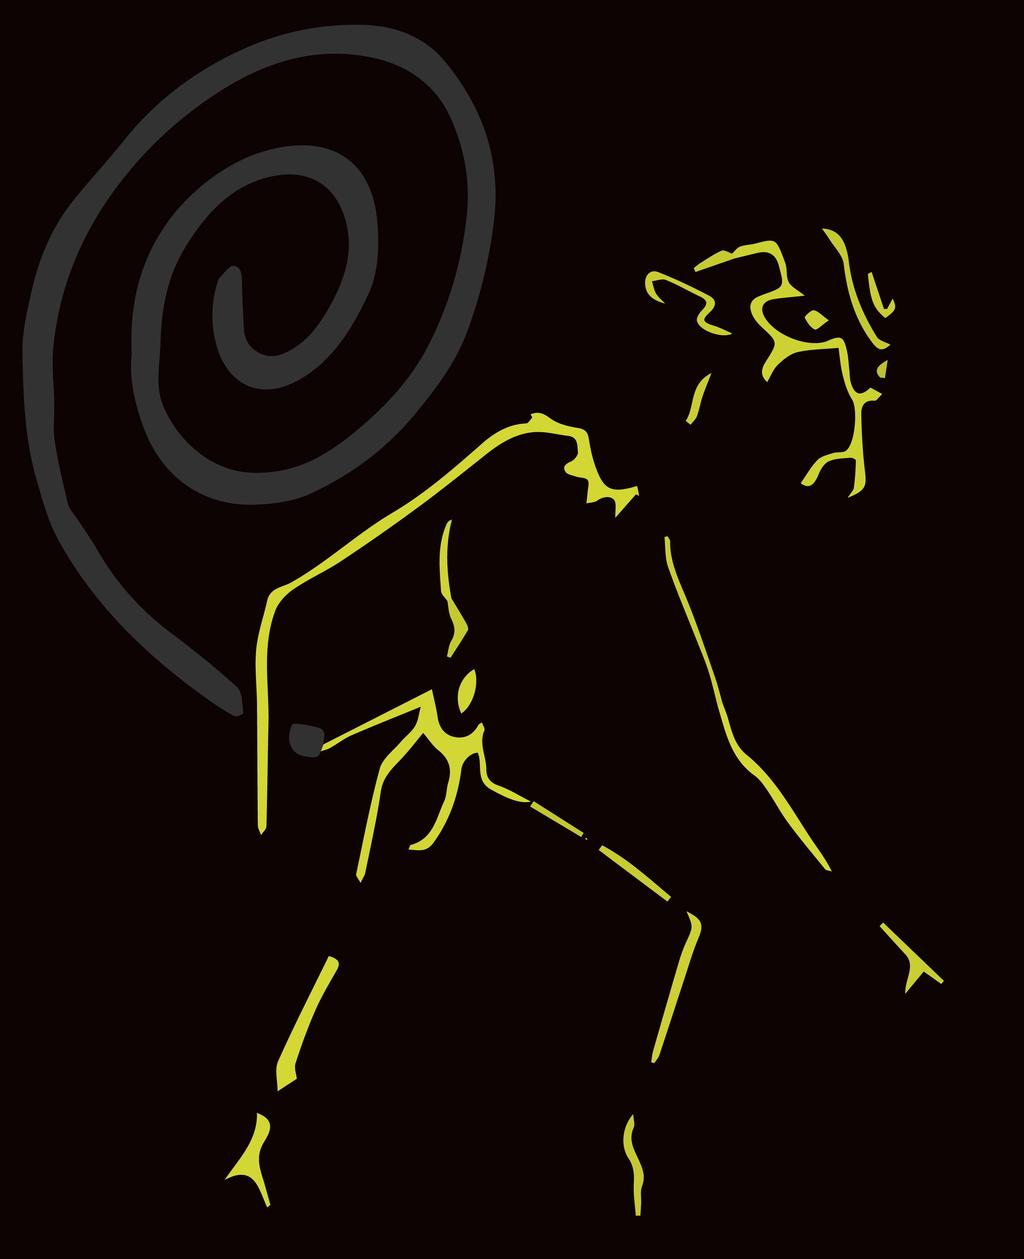 Earthbound Immortal Cusillu by JayMatson 1024x1259